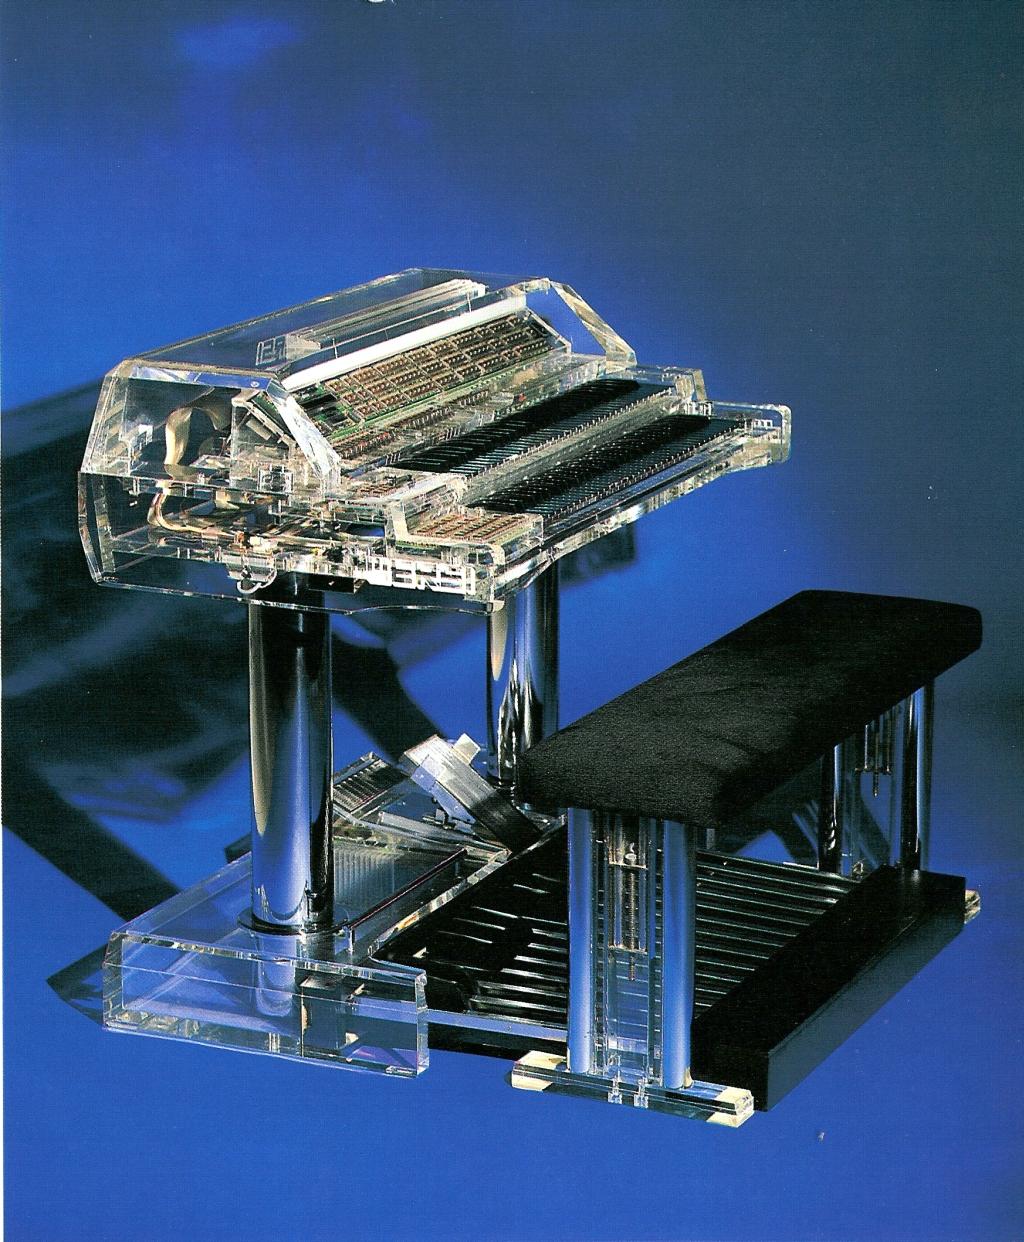 The Wersi Delta DX 500 organ